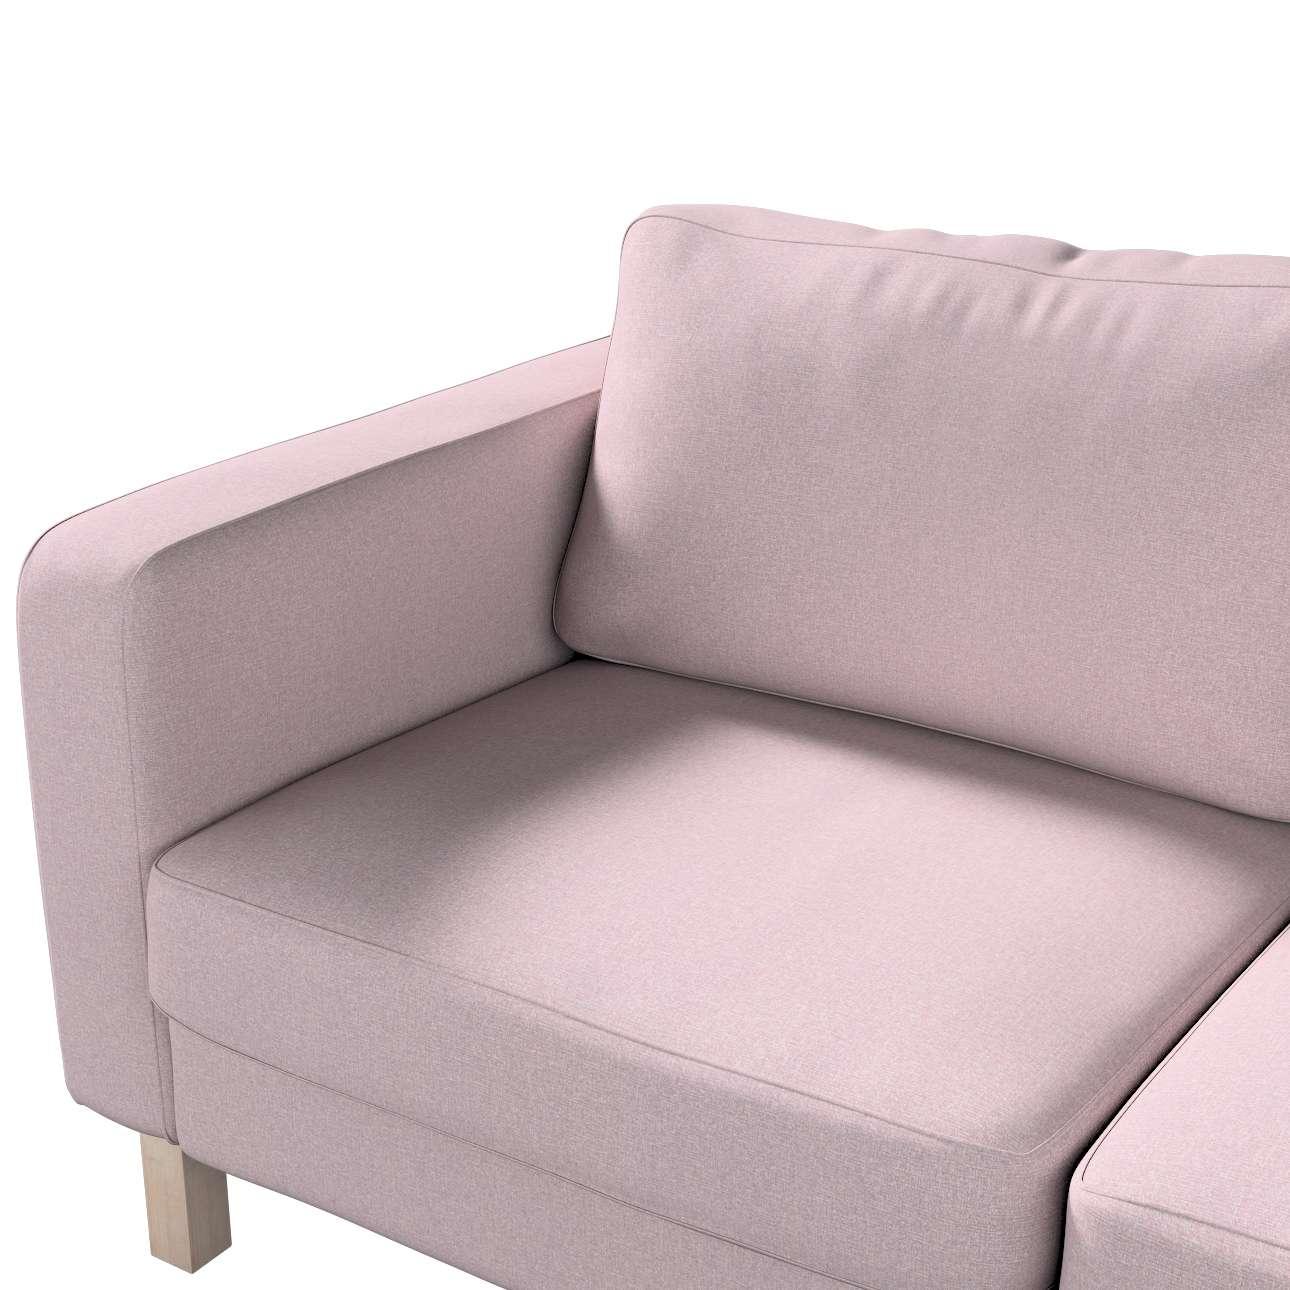 Karlstad klädsel 2-sits soffa - kort i kollektionen Amsterdam, Tyg: 704-51